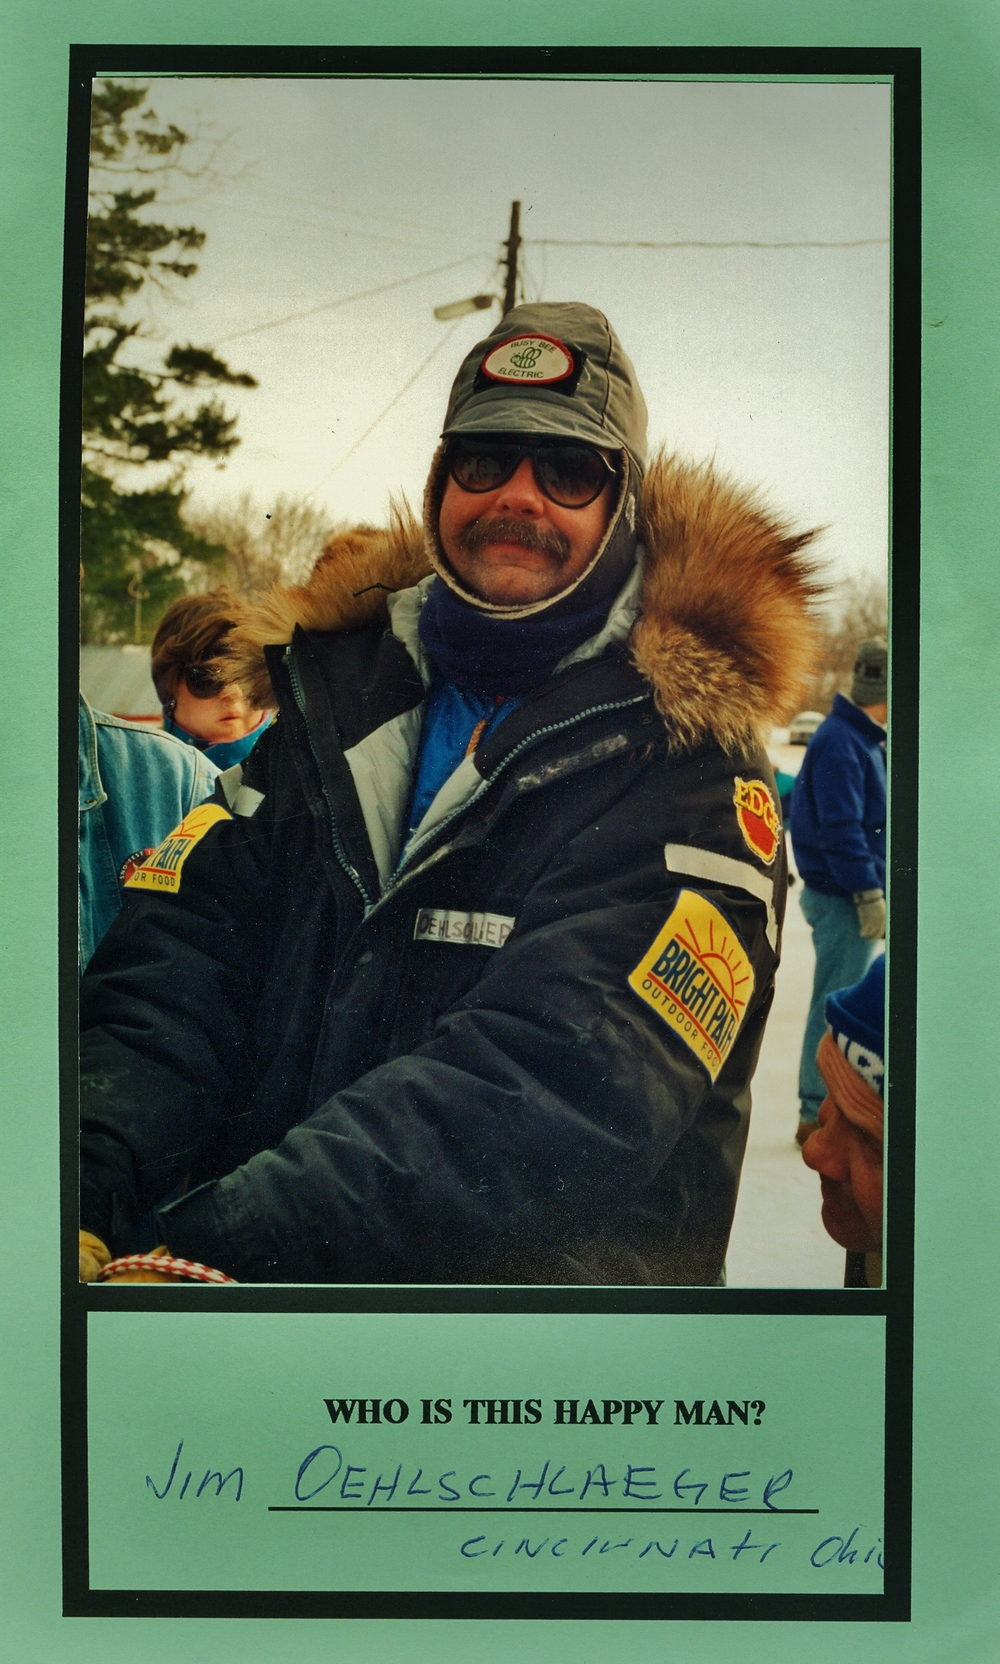 Snofest 1994 Jim Oehlschlaeger, Cincinnati, Ohio.jpg